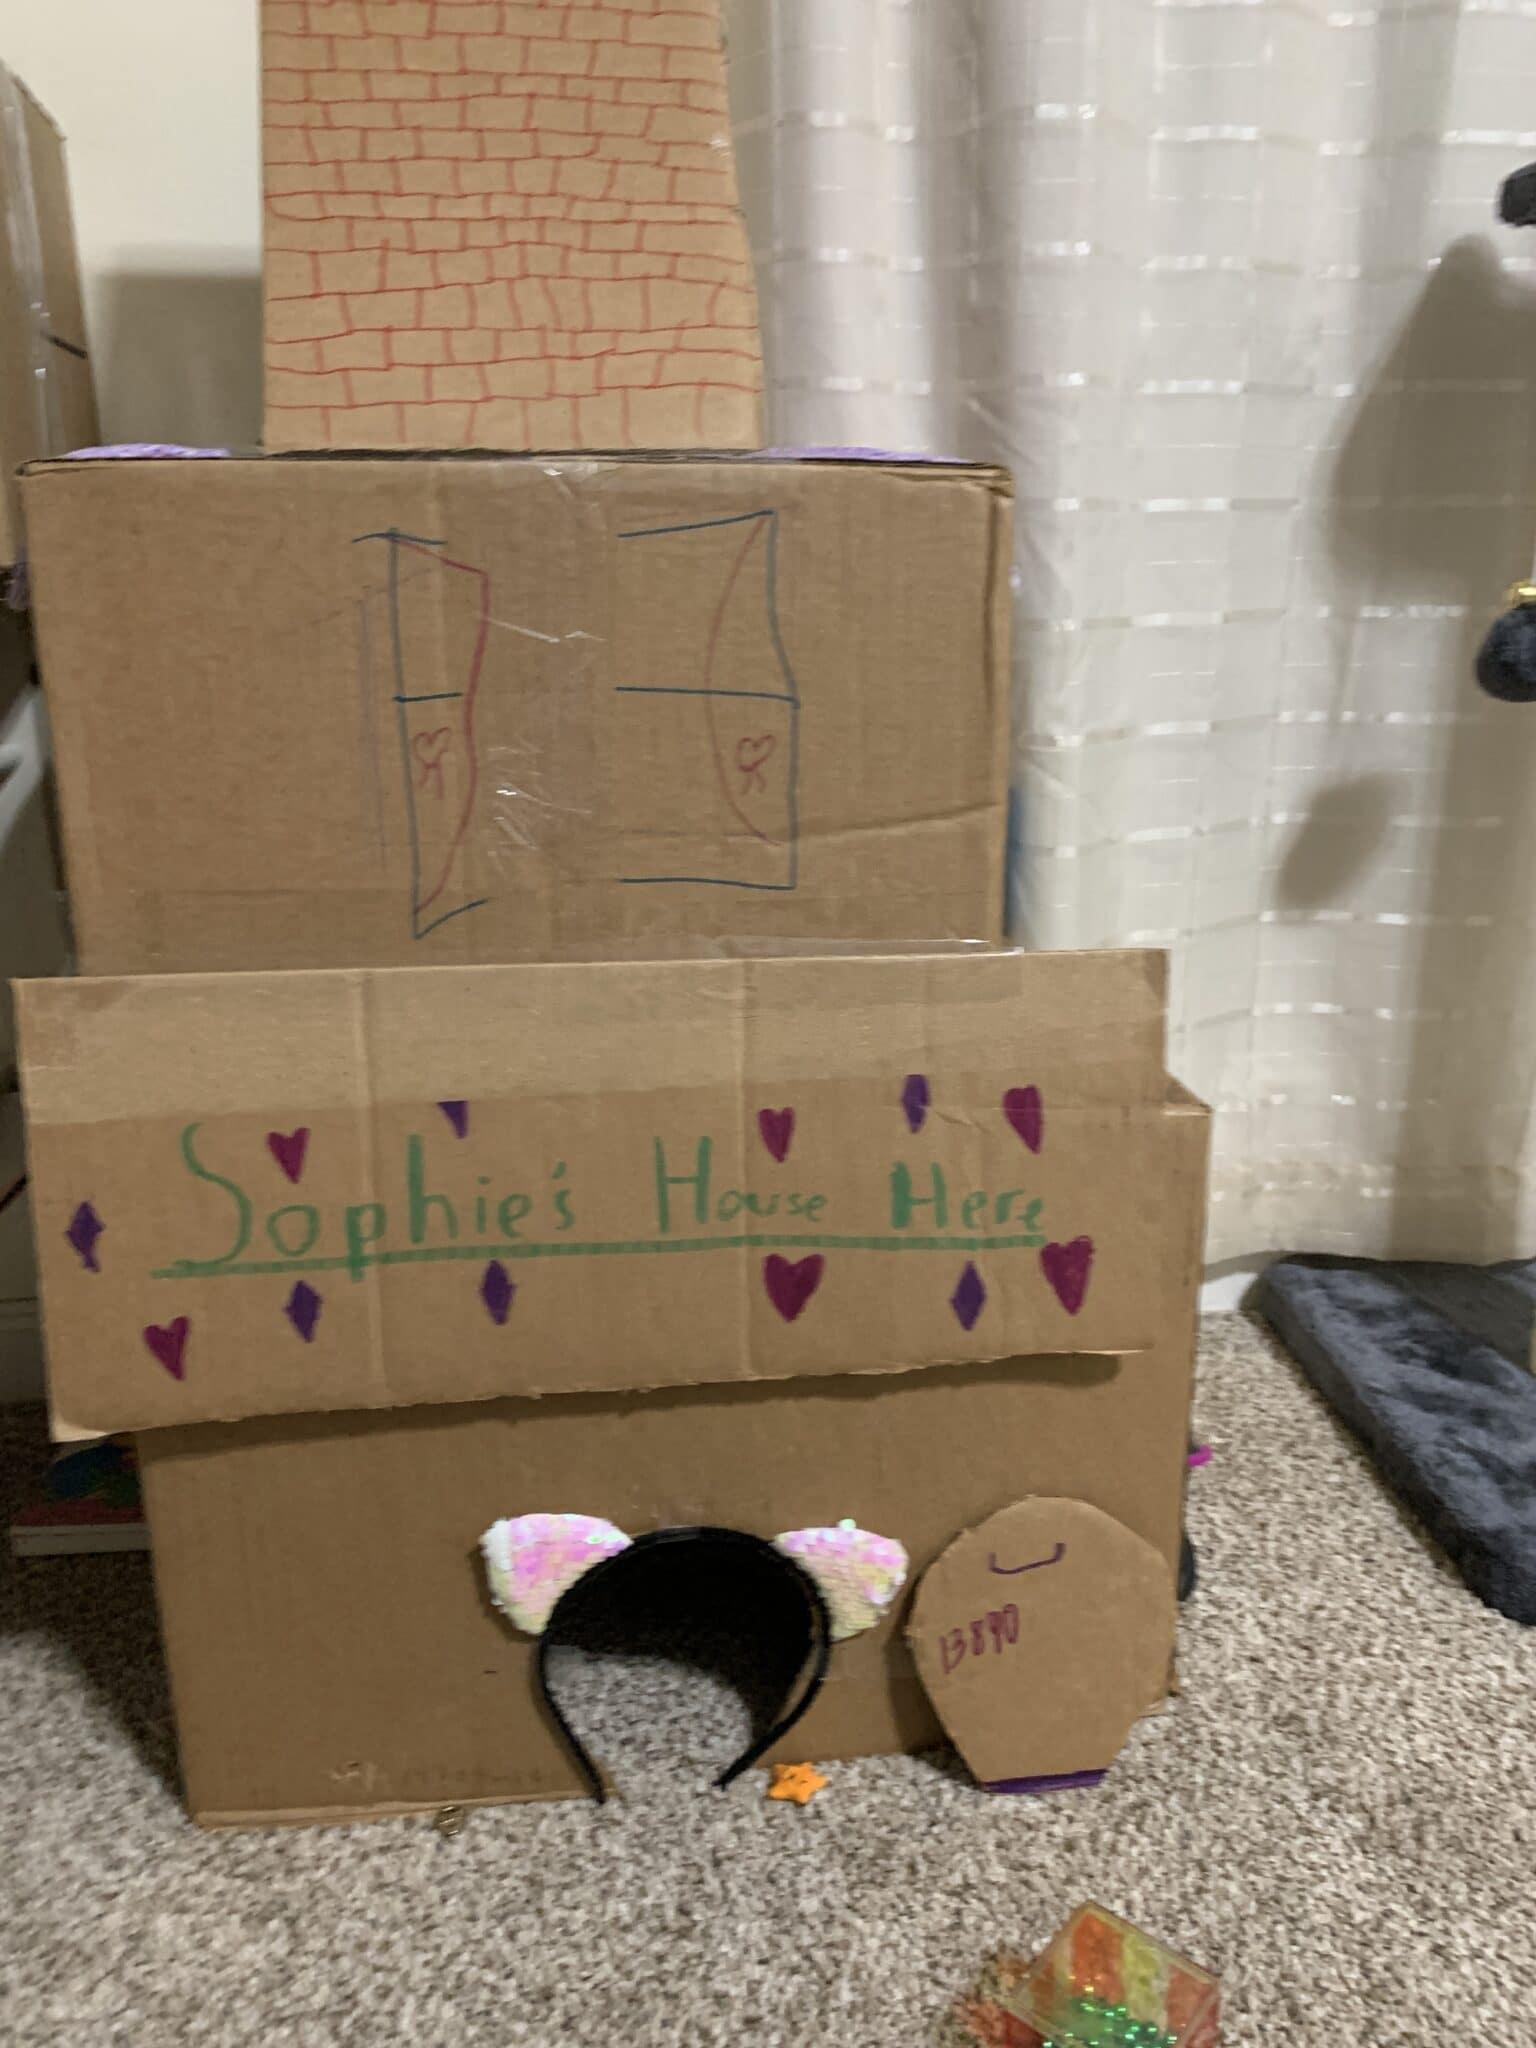 sophie's house box